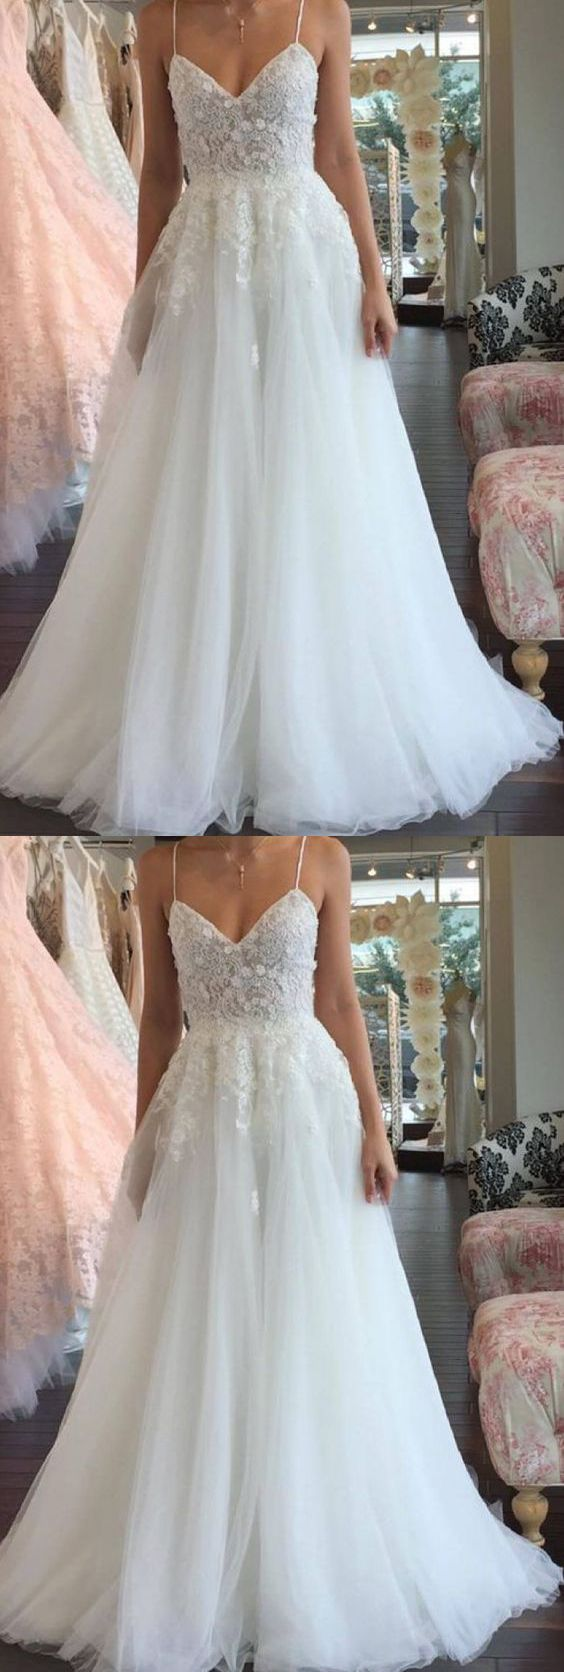 Elegant A Line V Neck Spaghetti Straps White Tulle Wedding Dress with Applique